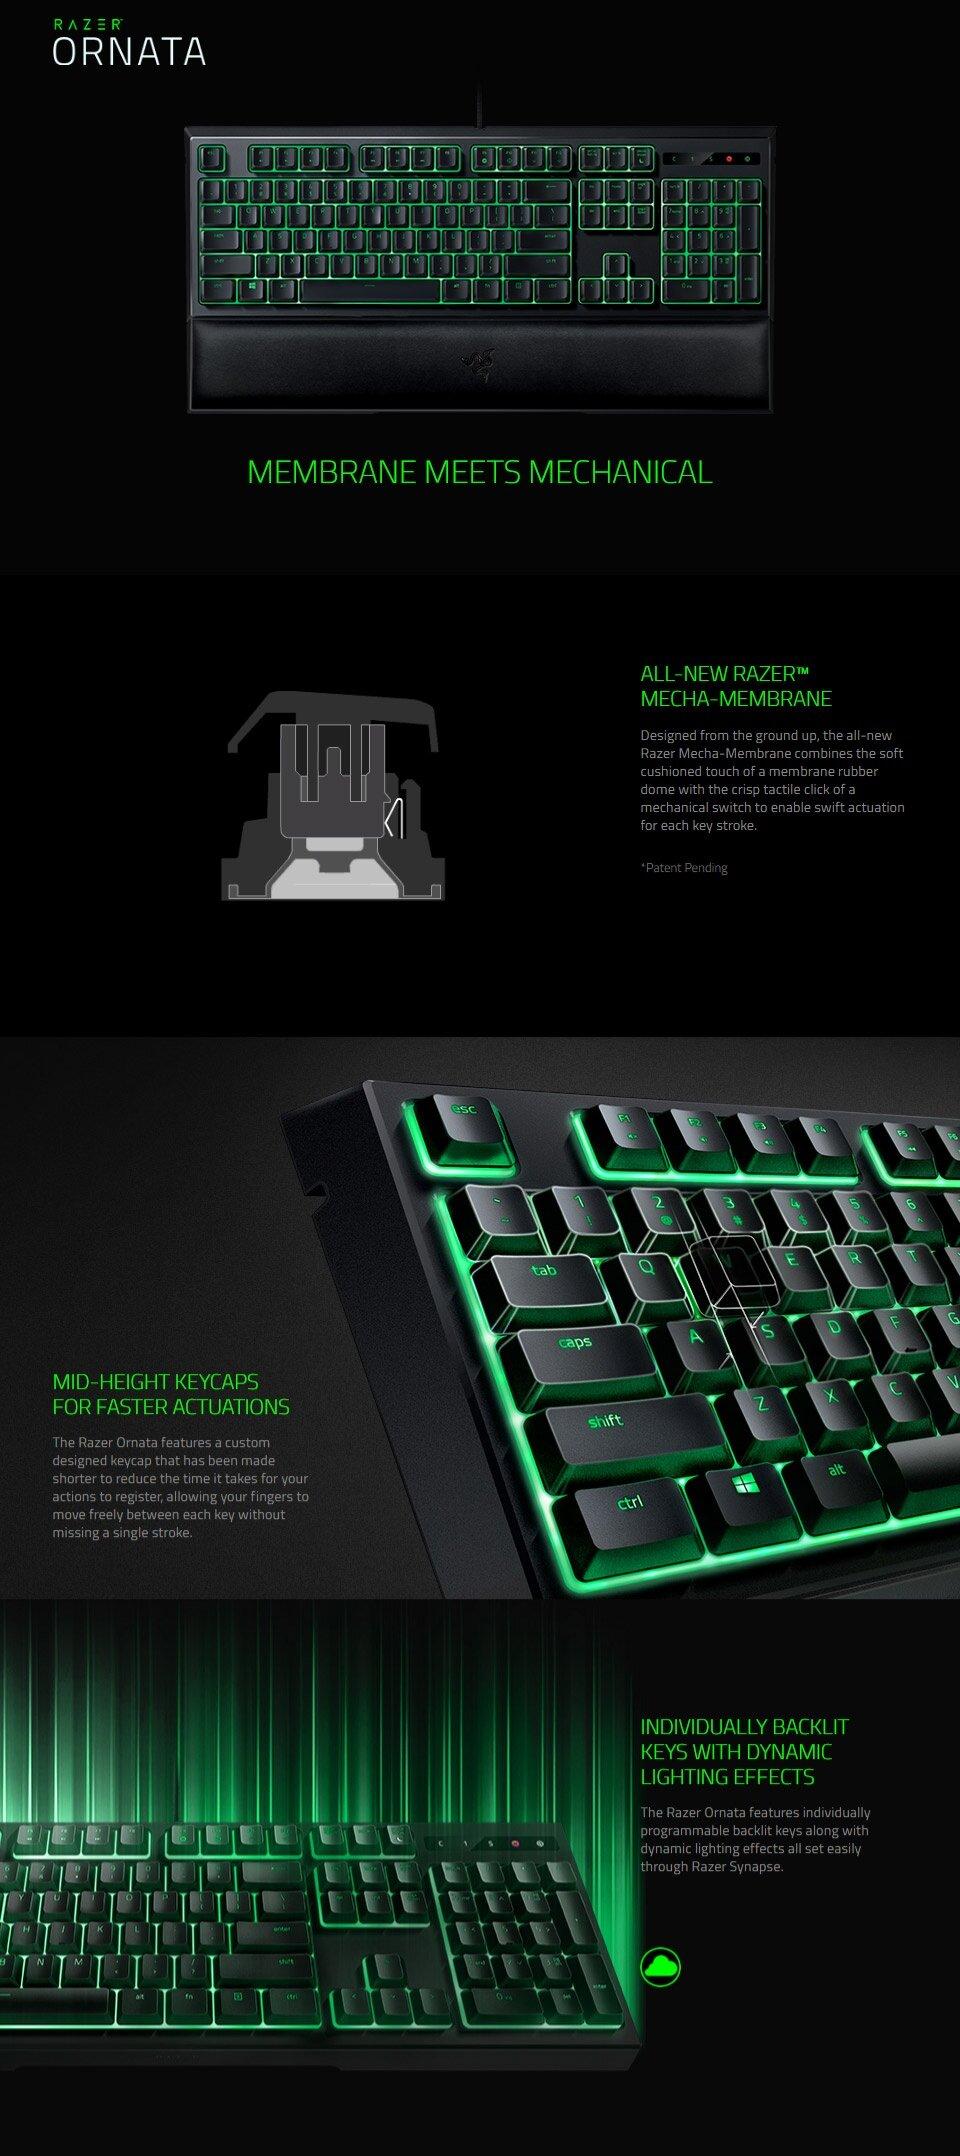 RAZER Ornata Expert Mecha-Membrane Gaming Keyboard RZ03-02041700-R3M1